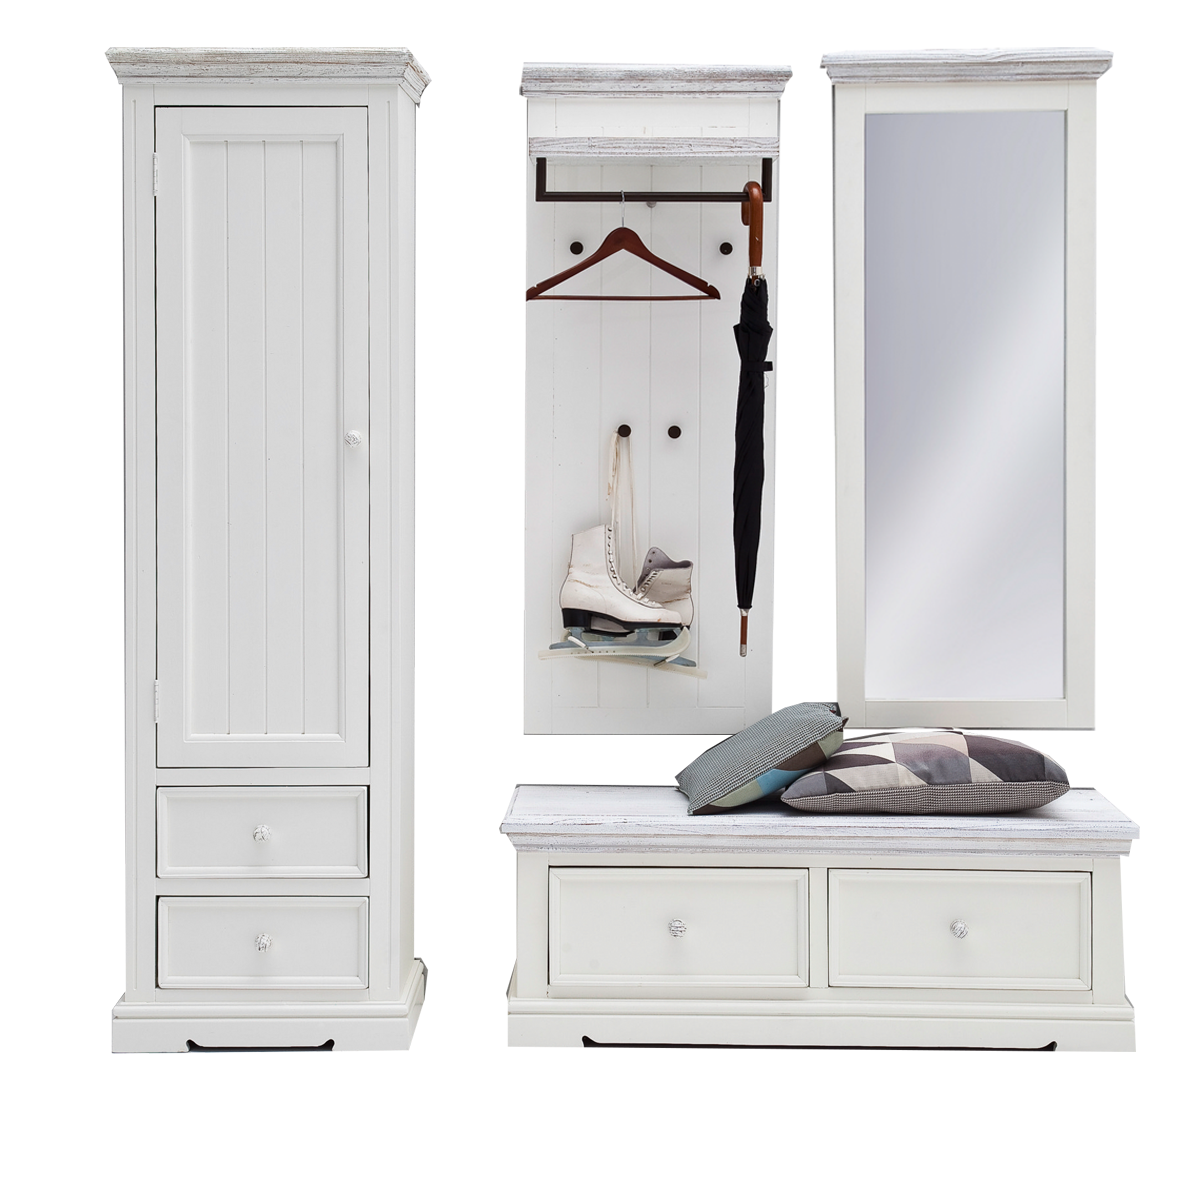 mca opus garderoben set 3 komplette garderobe f r flur mit garderobenschrank bank wandpaneel. Black Bedroom Furniture Sets. Home Design Ideas